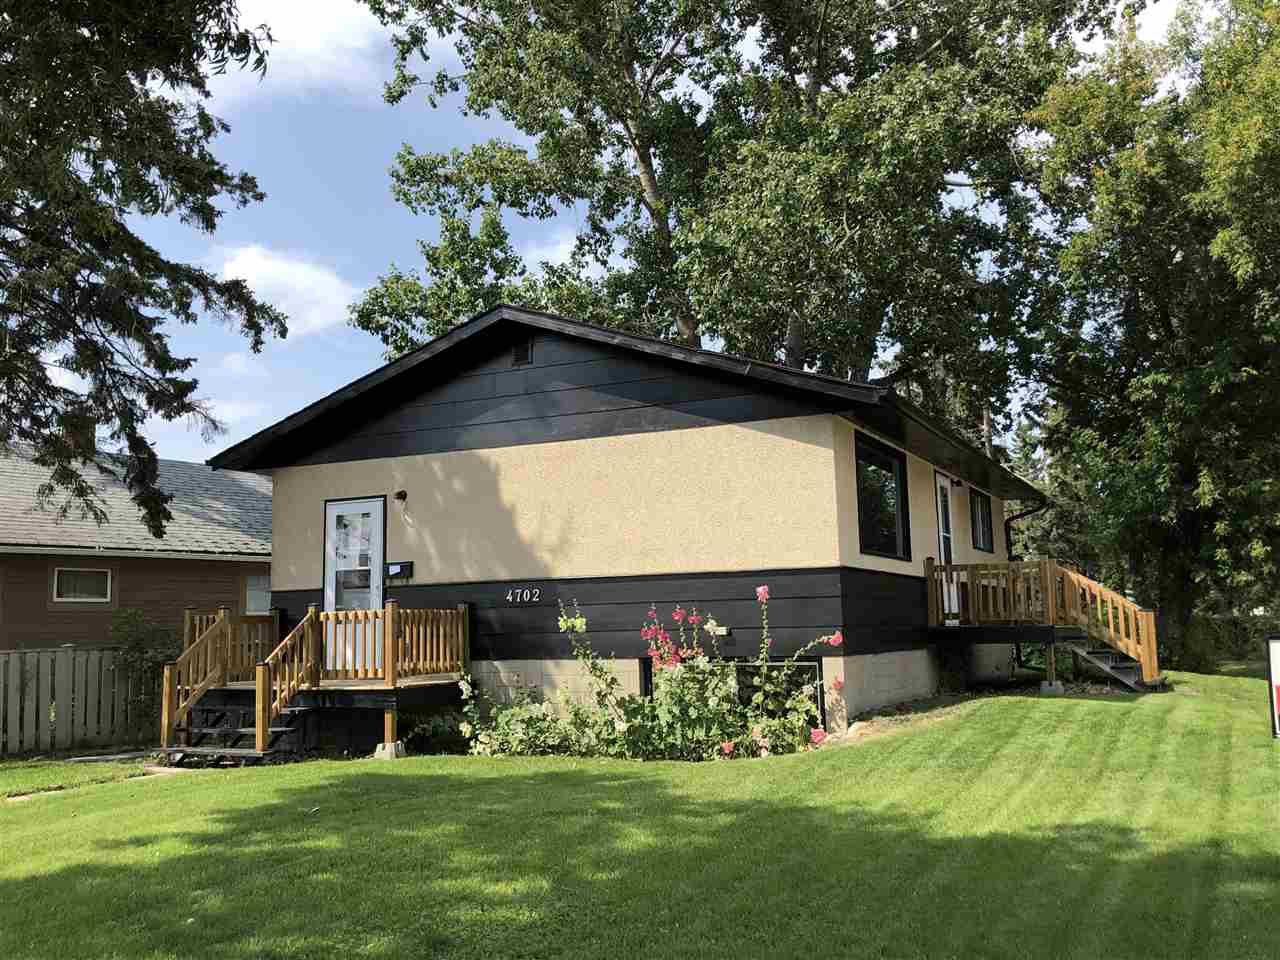 Main Photo: 4702 47 Avenue: Wetaskiwin House for sale : MLS®# E4152672